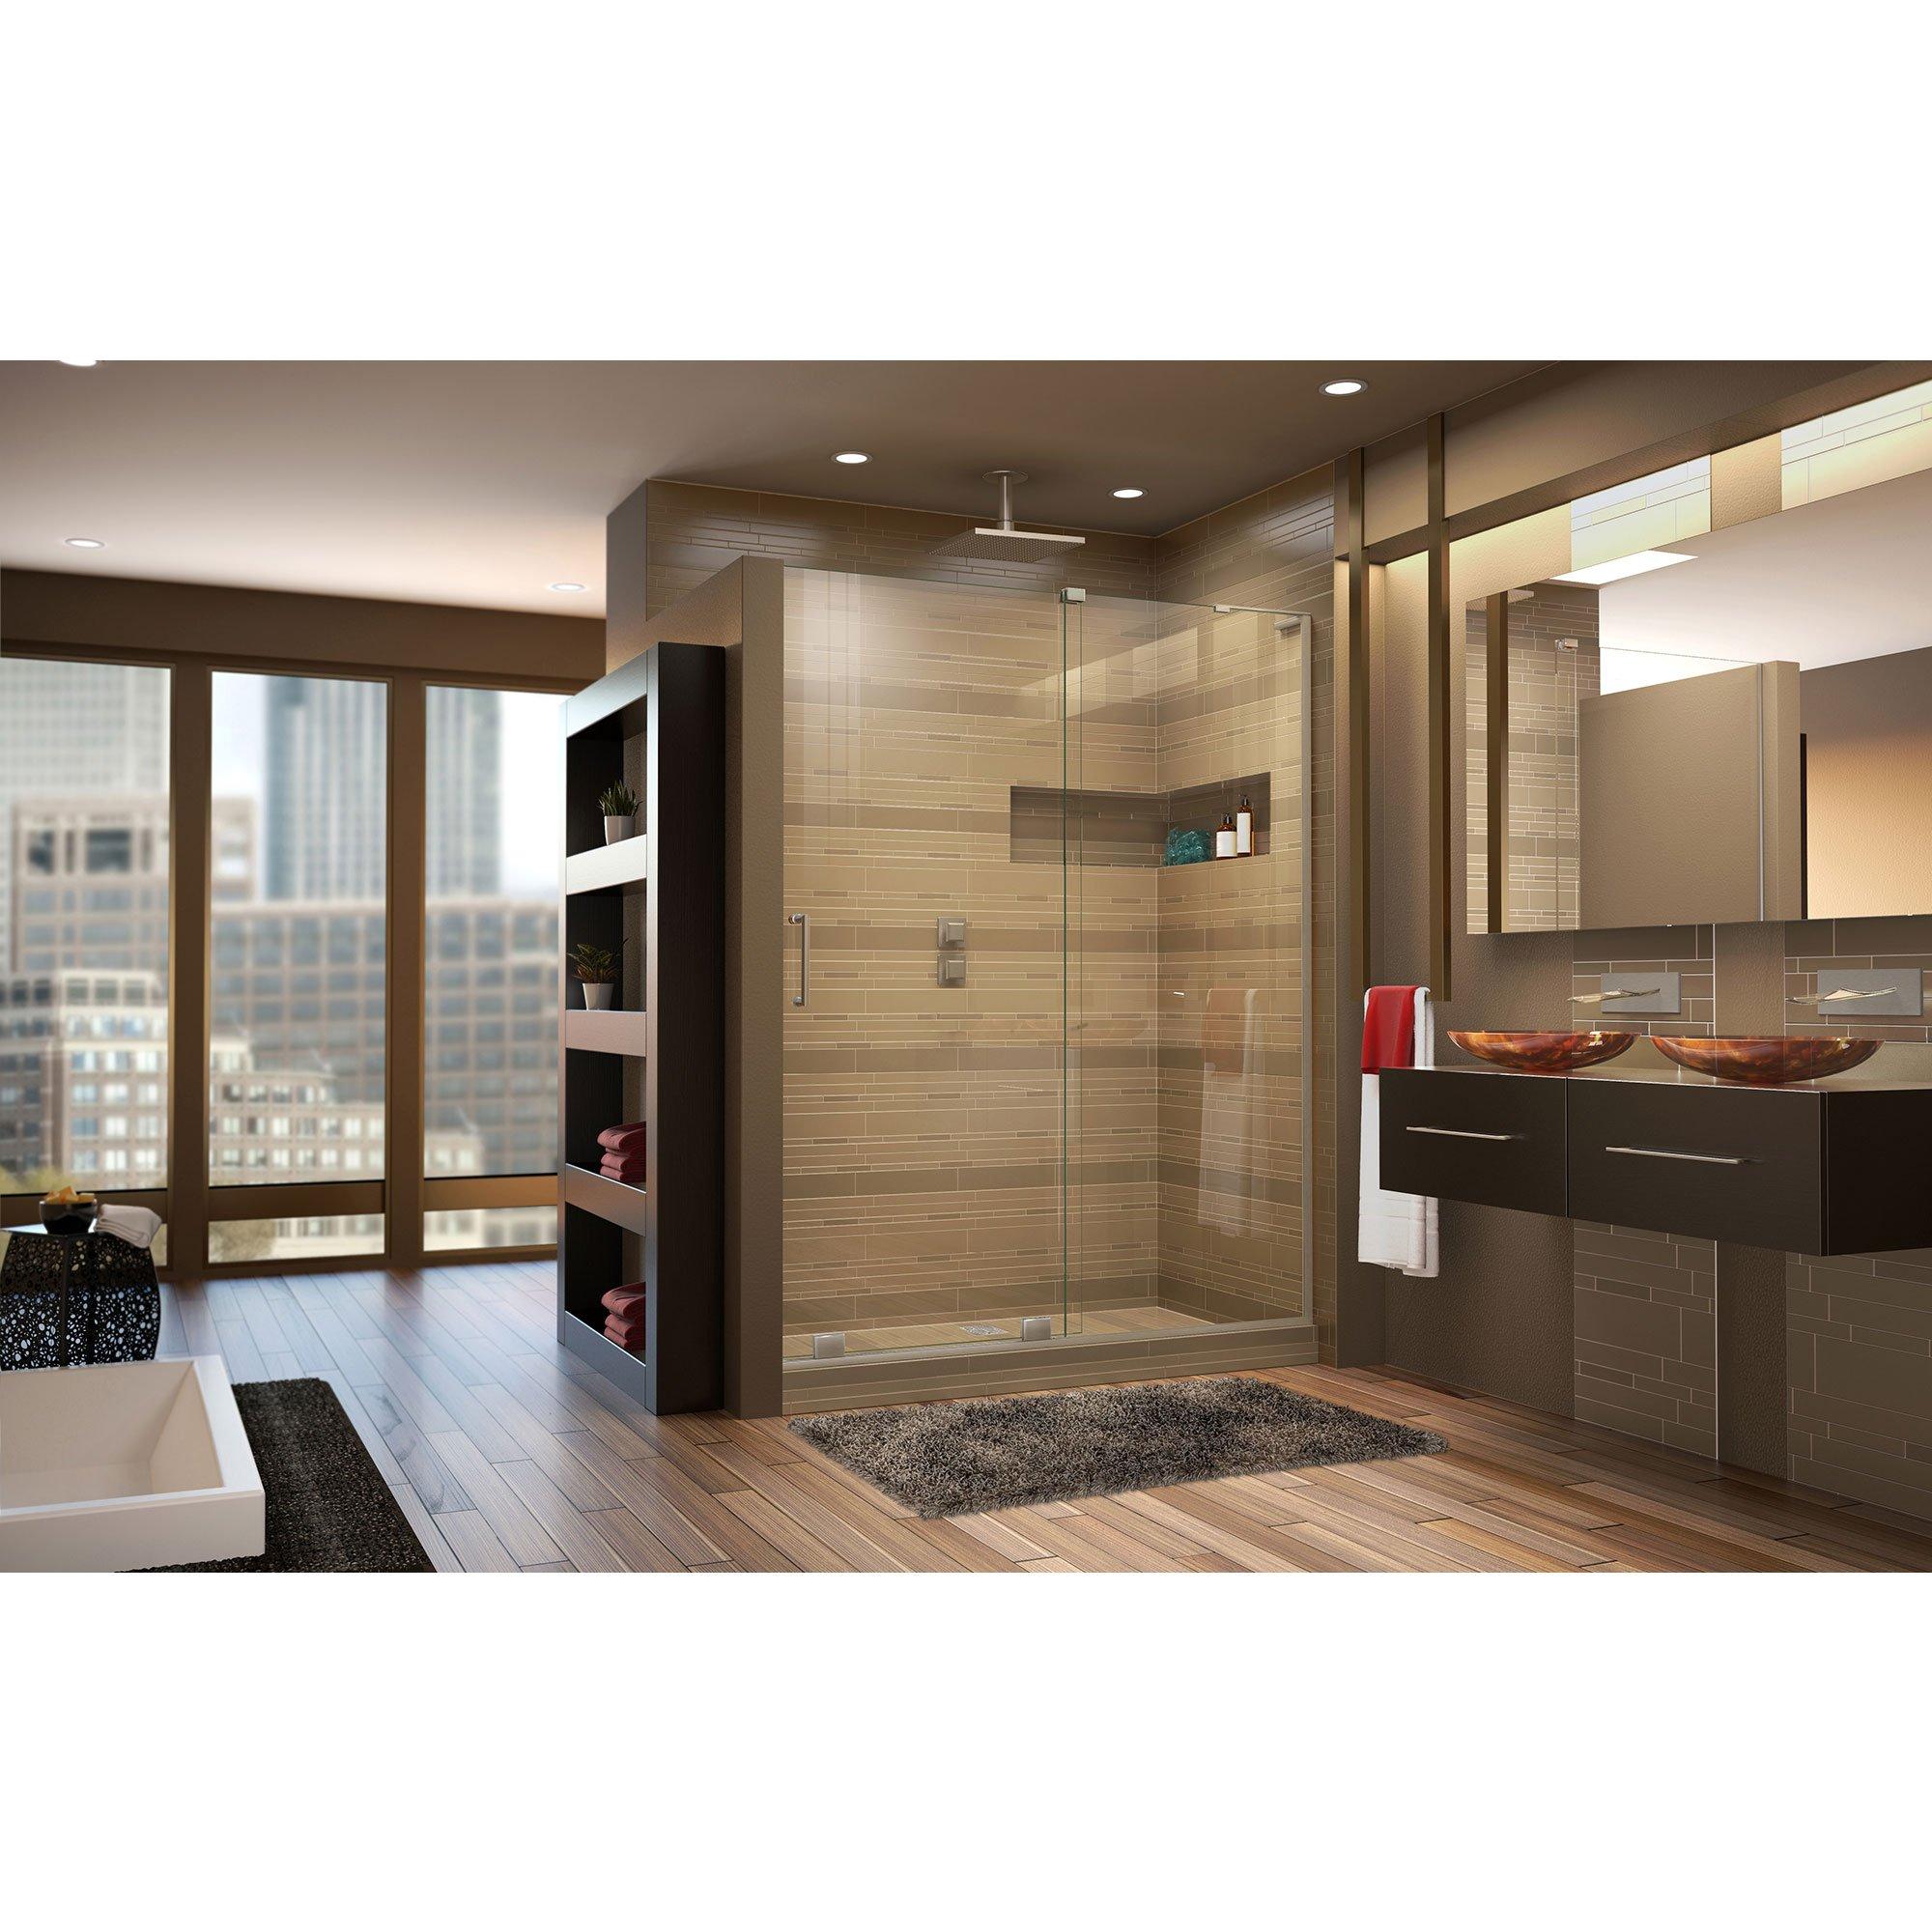 DreamLine Mirage-X 56-60 in. Width, Frameless Sliding Shower Door, 3/8'' Glass, Brushed Nickel Finish by DreamLine (Image #8)